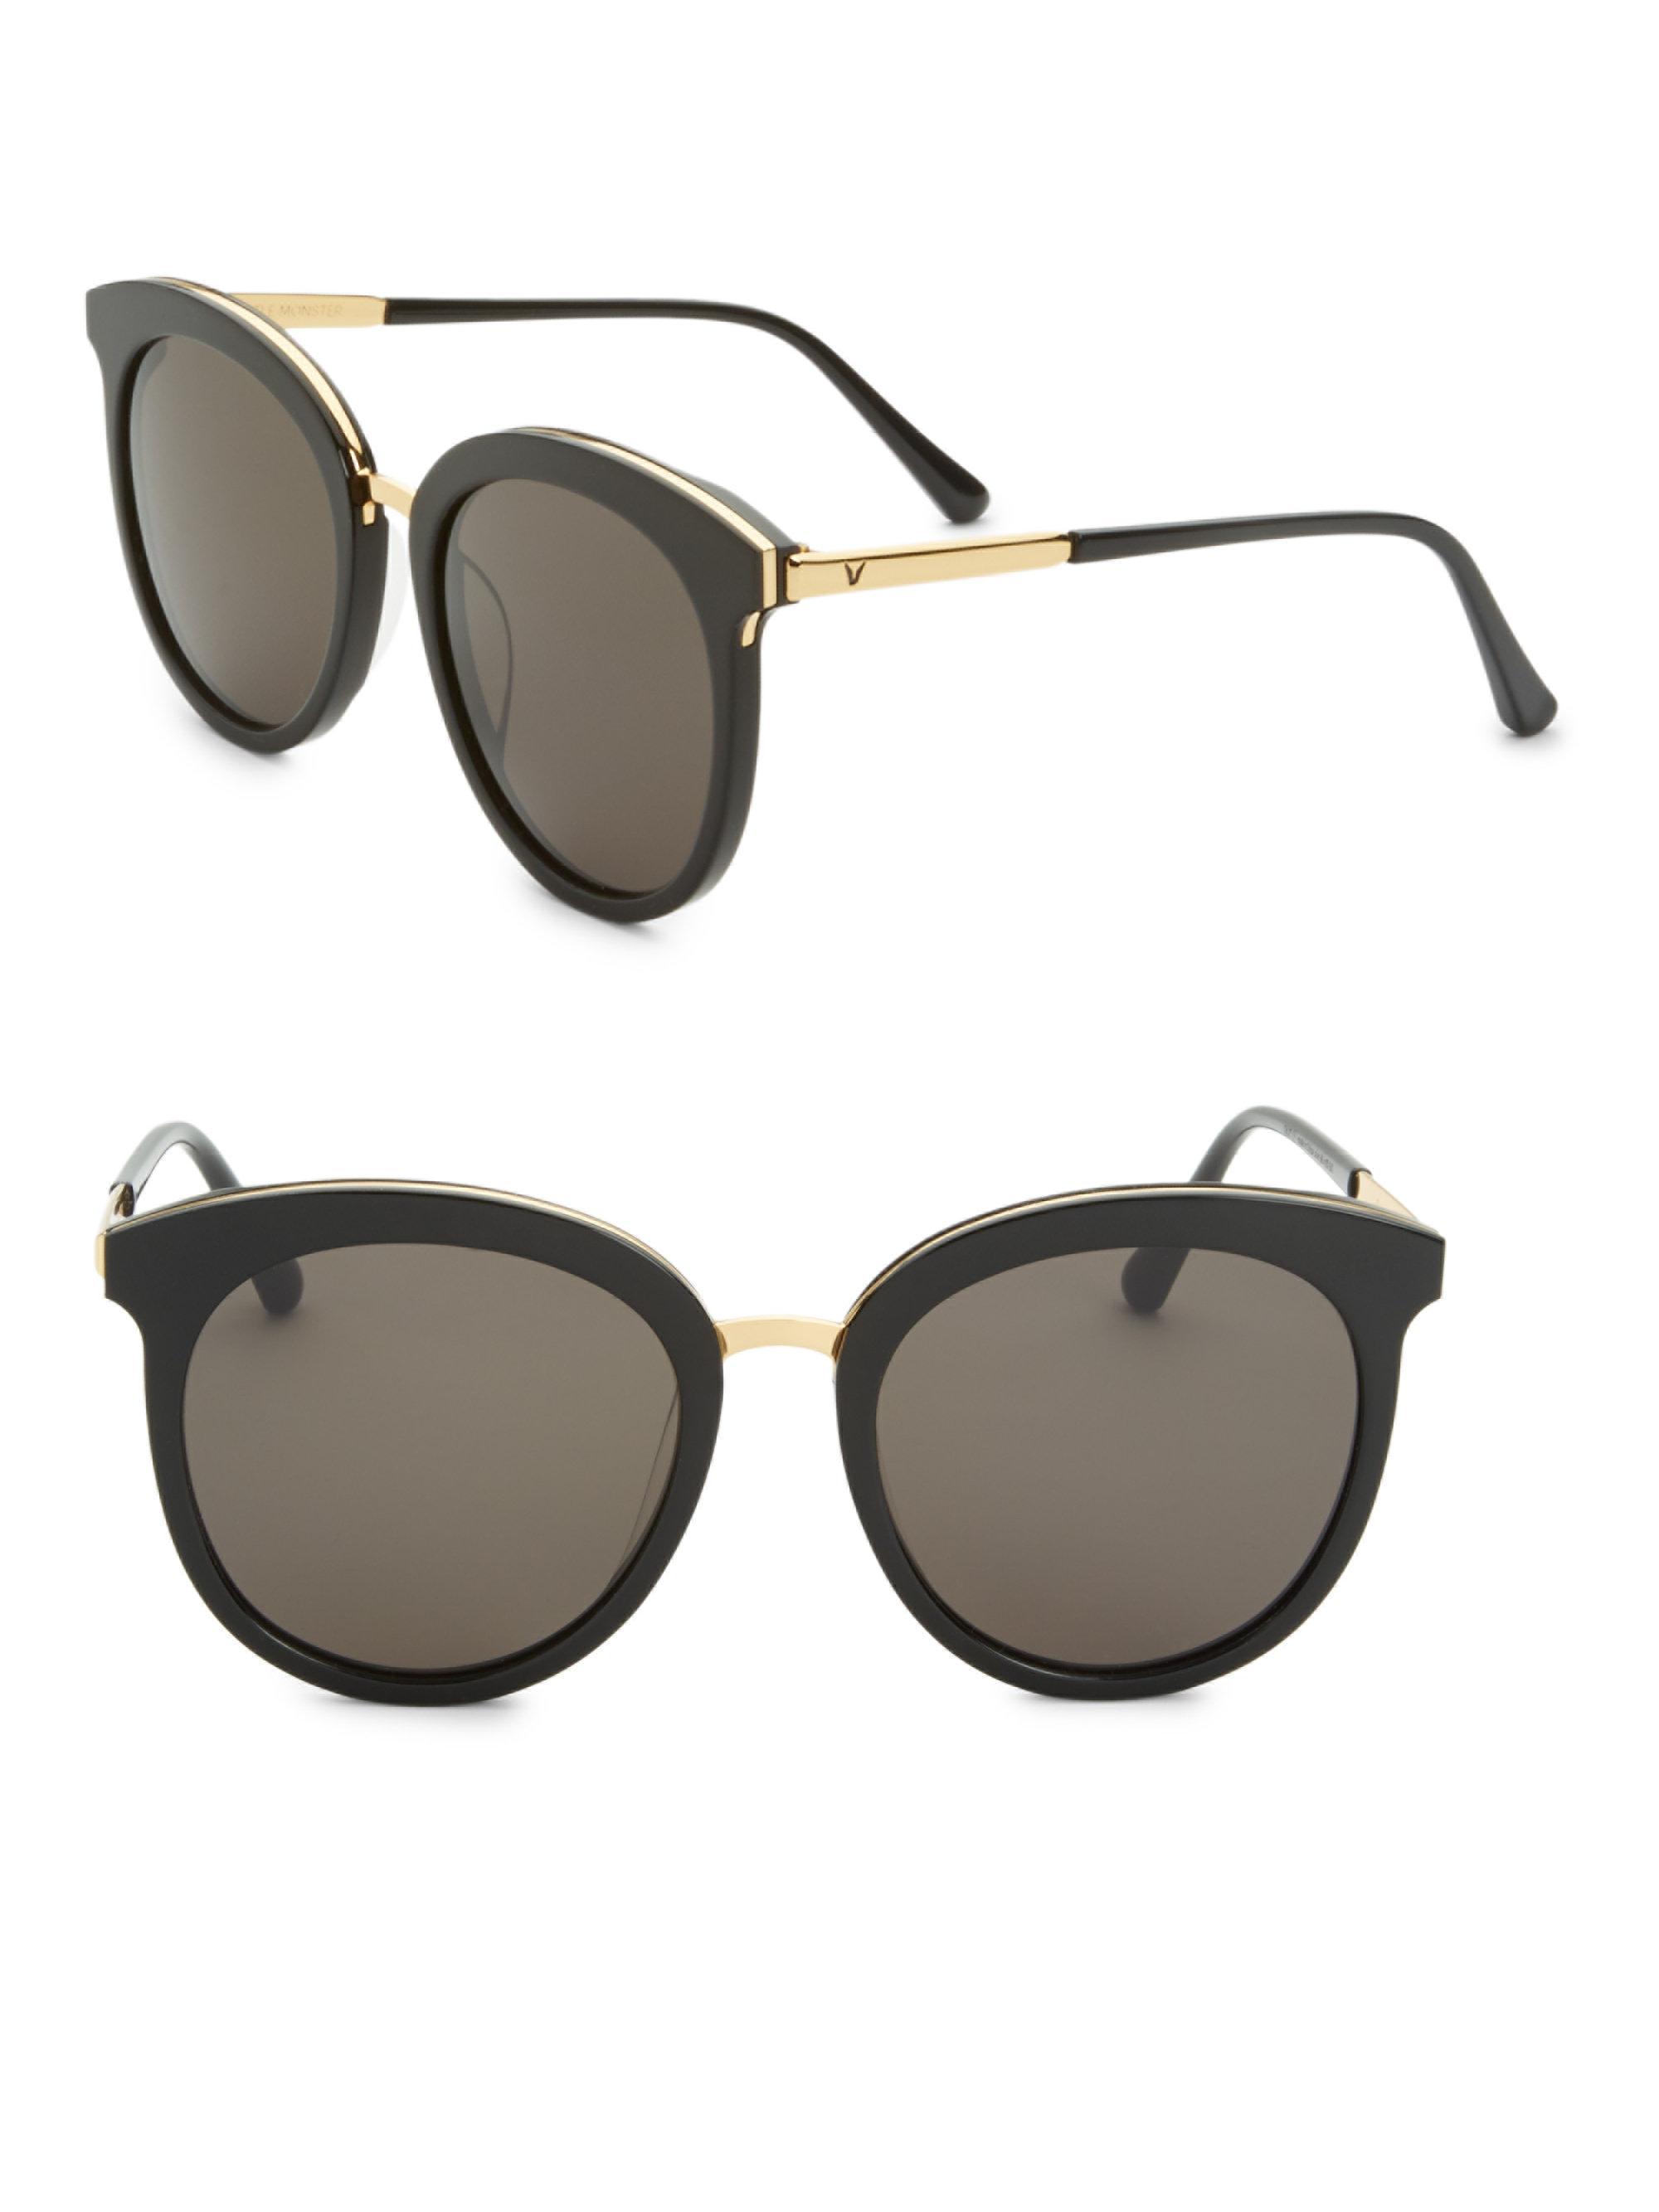 7e54a9fa6a Gentle Monster Someone Tale 55mm Sunglasses in Black - Lyst